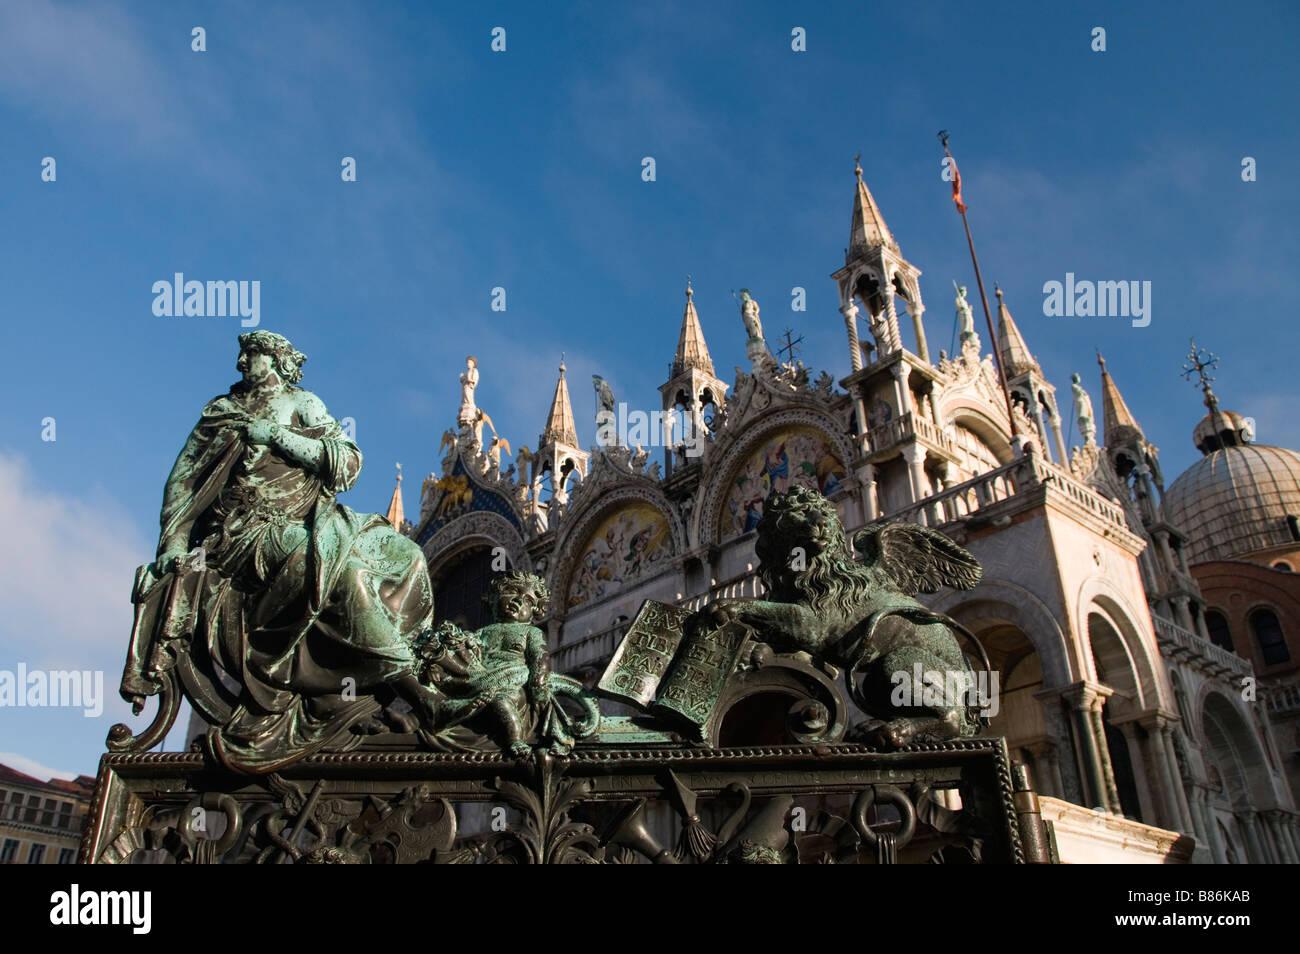 Loggetta Of San Marco Stock Photos & Loggetta Of San Marco Stock ...